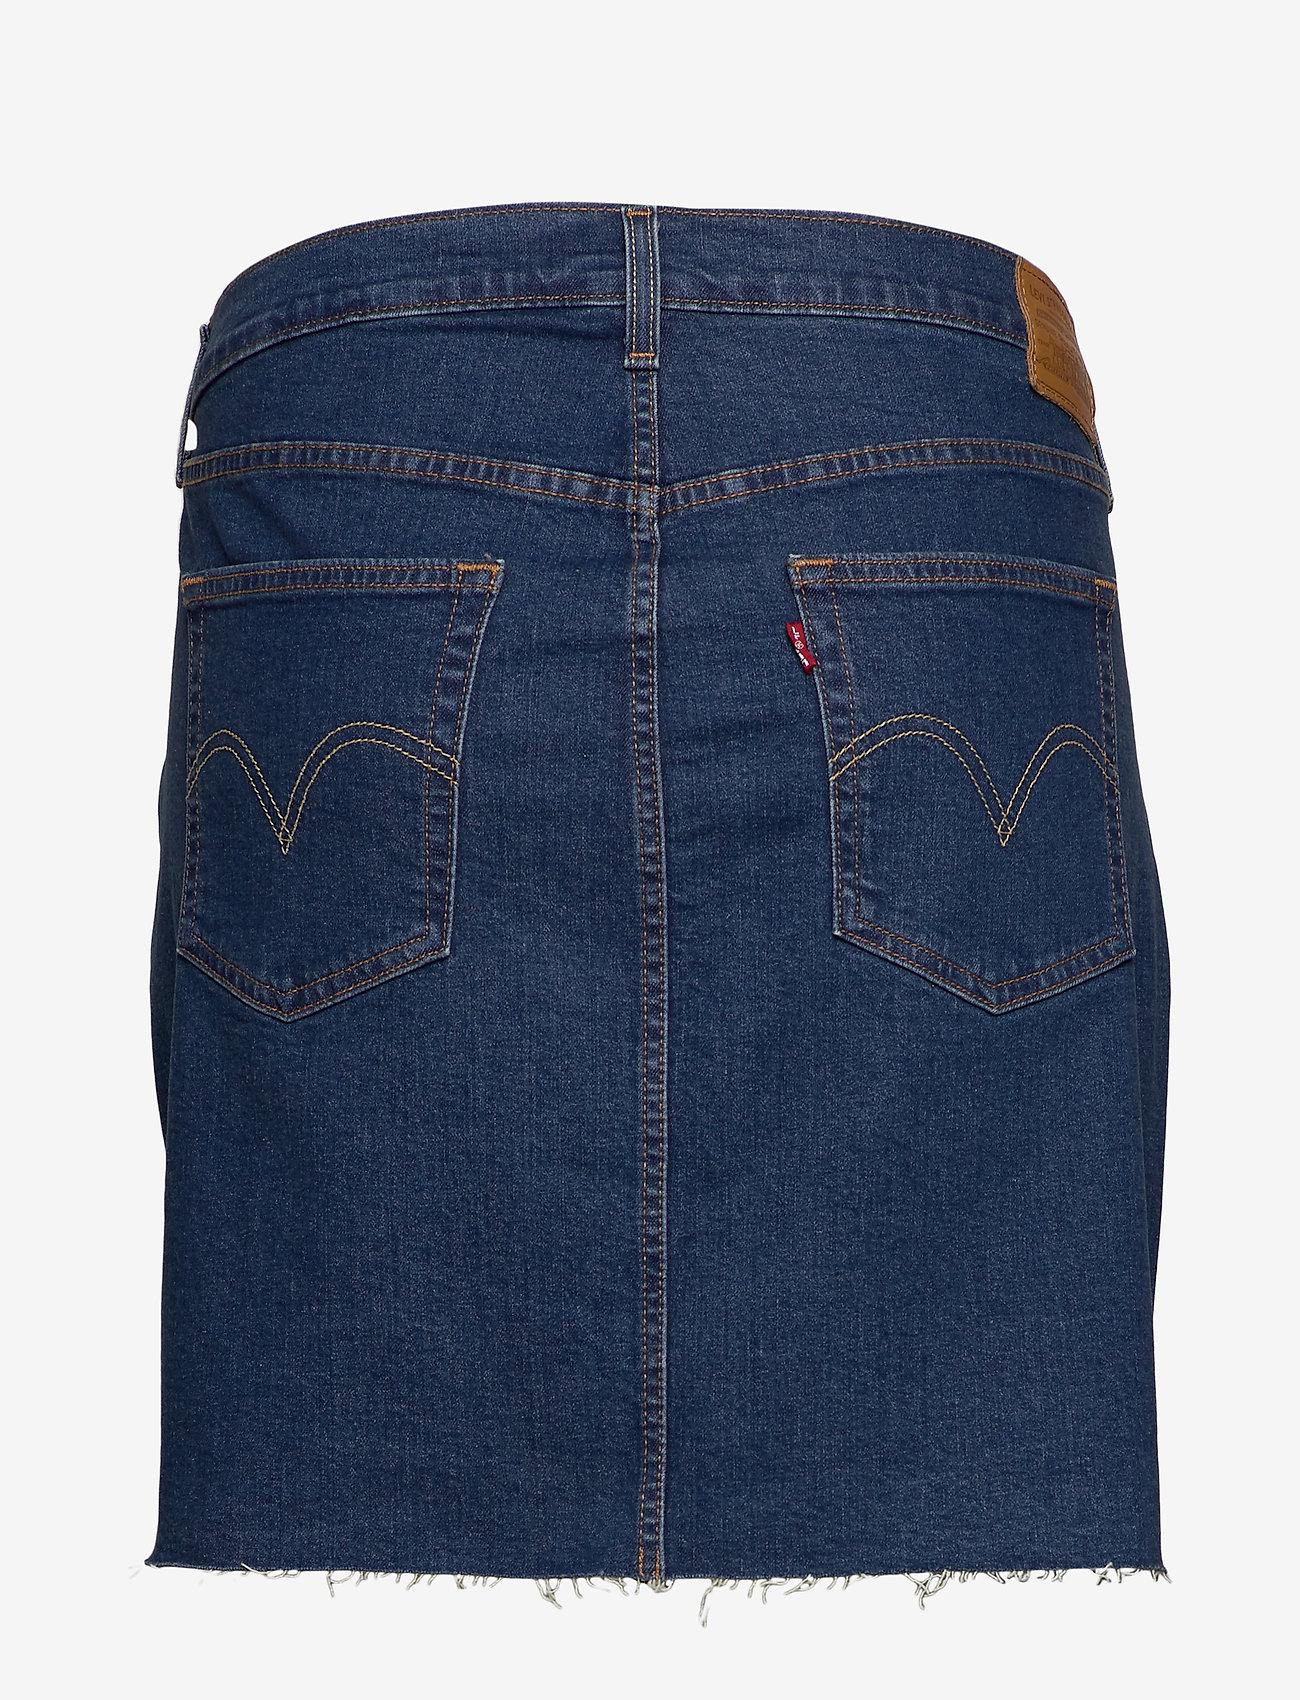 Levi's Plus Size - PL DECONSTRUCTED SKIRT MEET IN - jeansrokken - med indigo - flat finish - 1